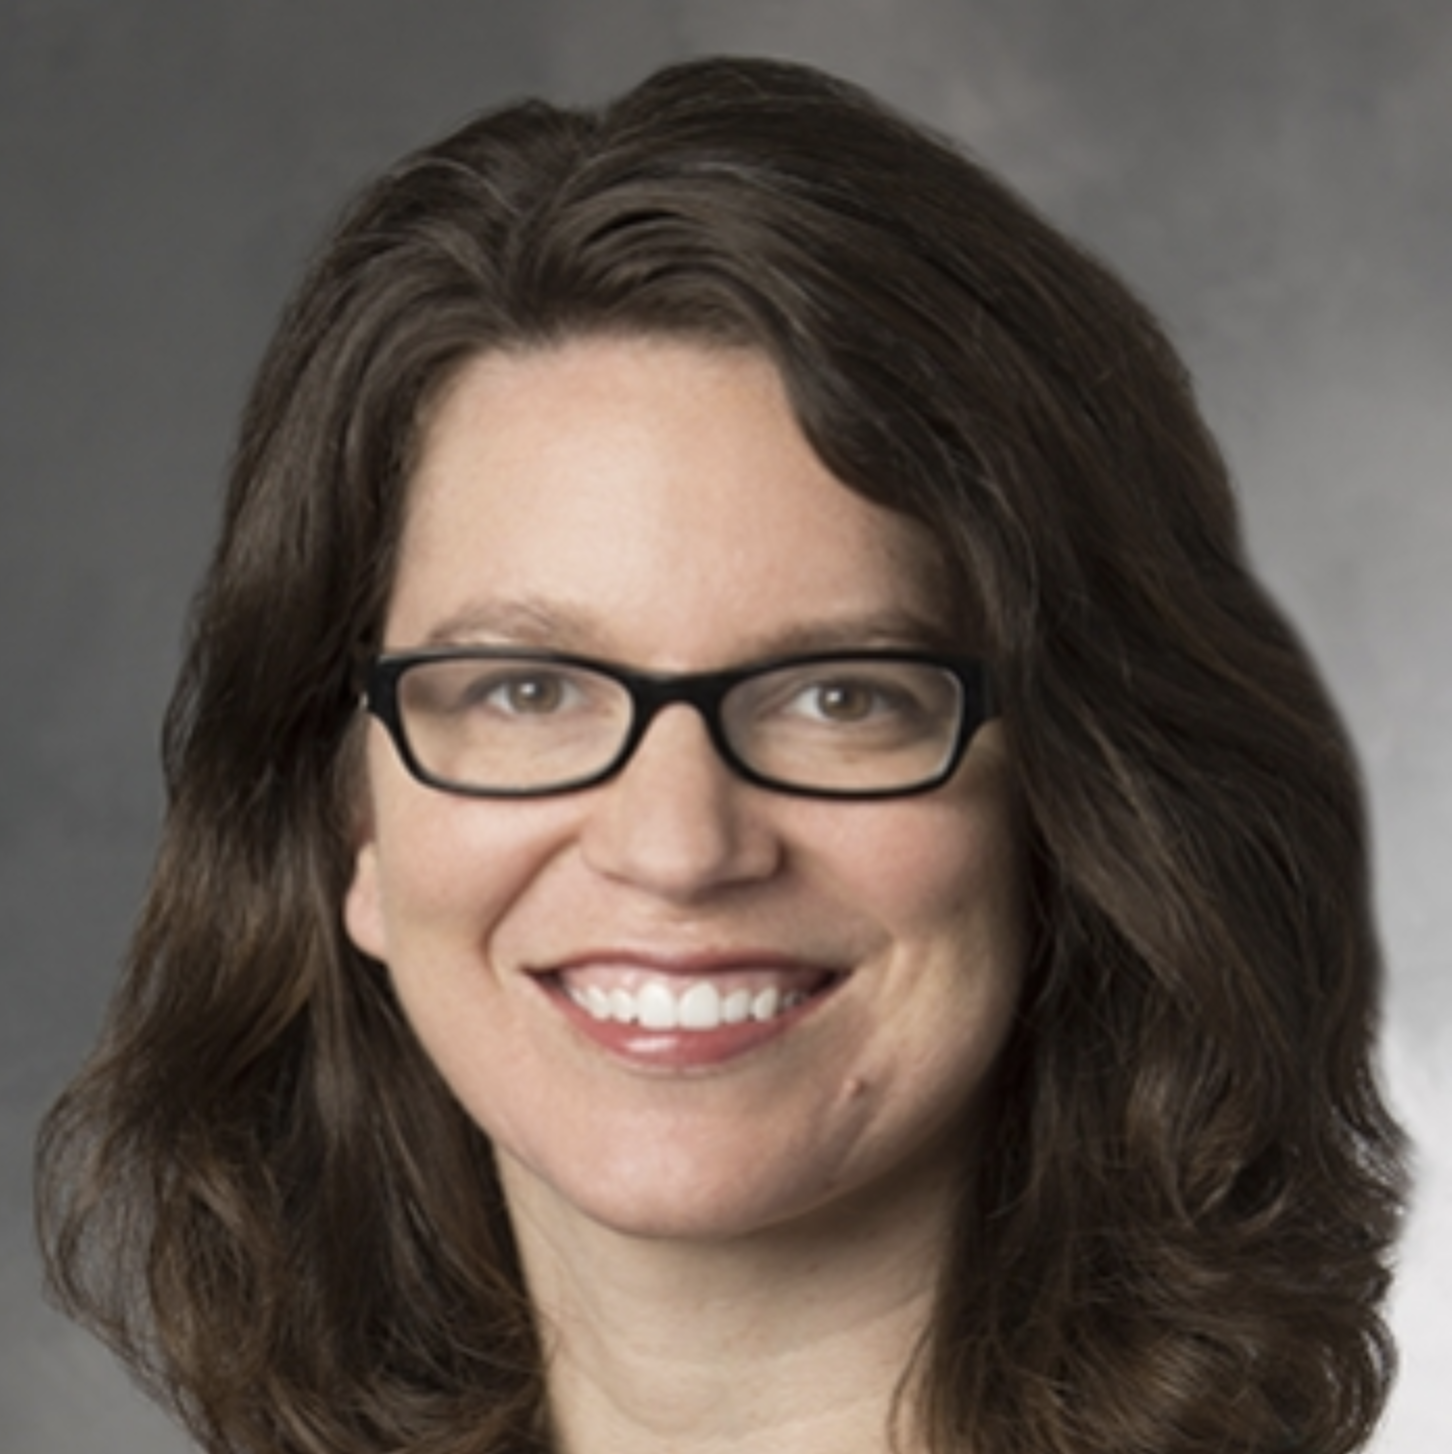 Dr. Angela Rogers, Associate Professor of Medicine